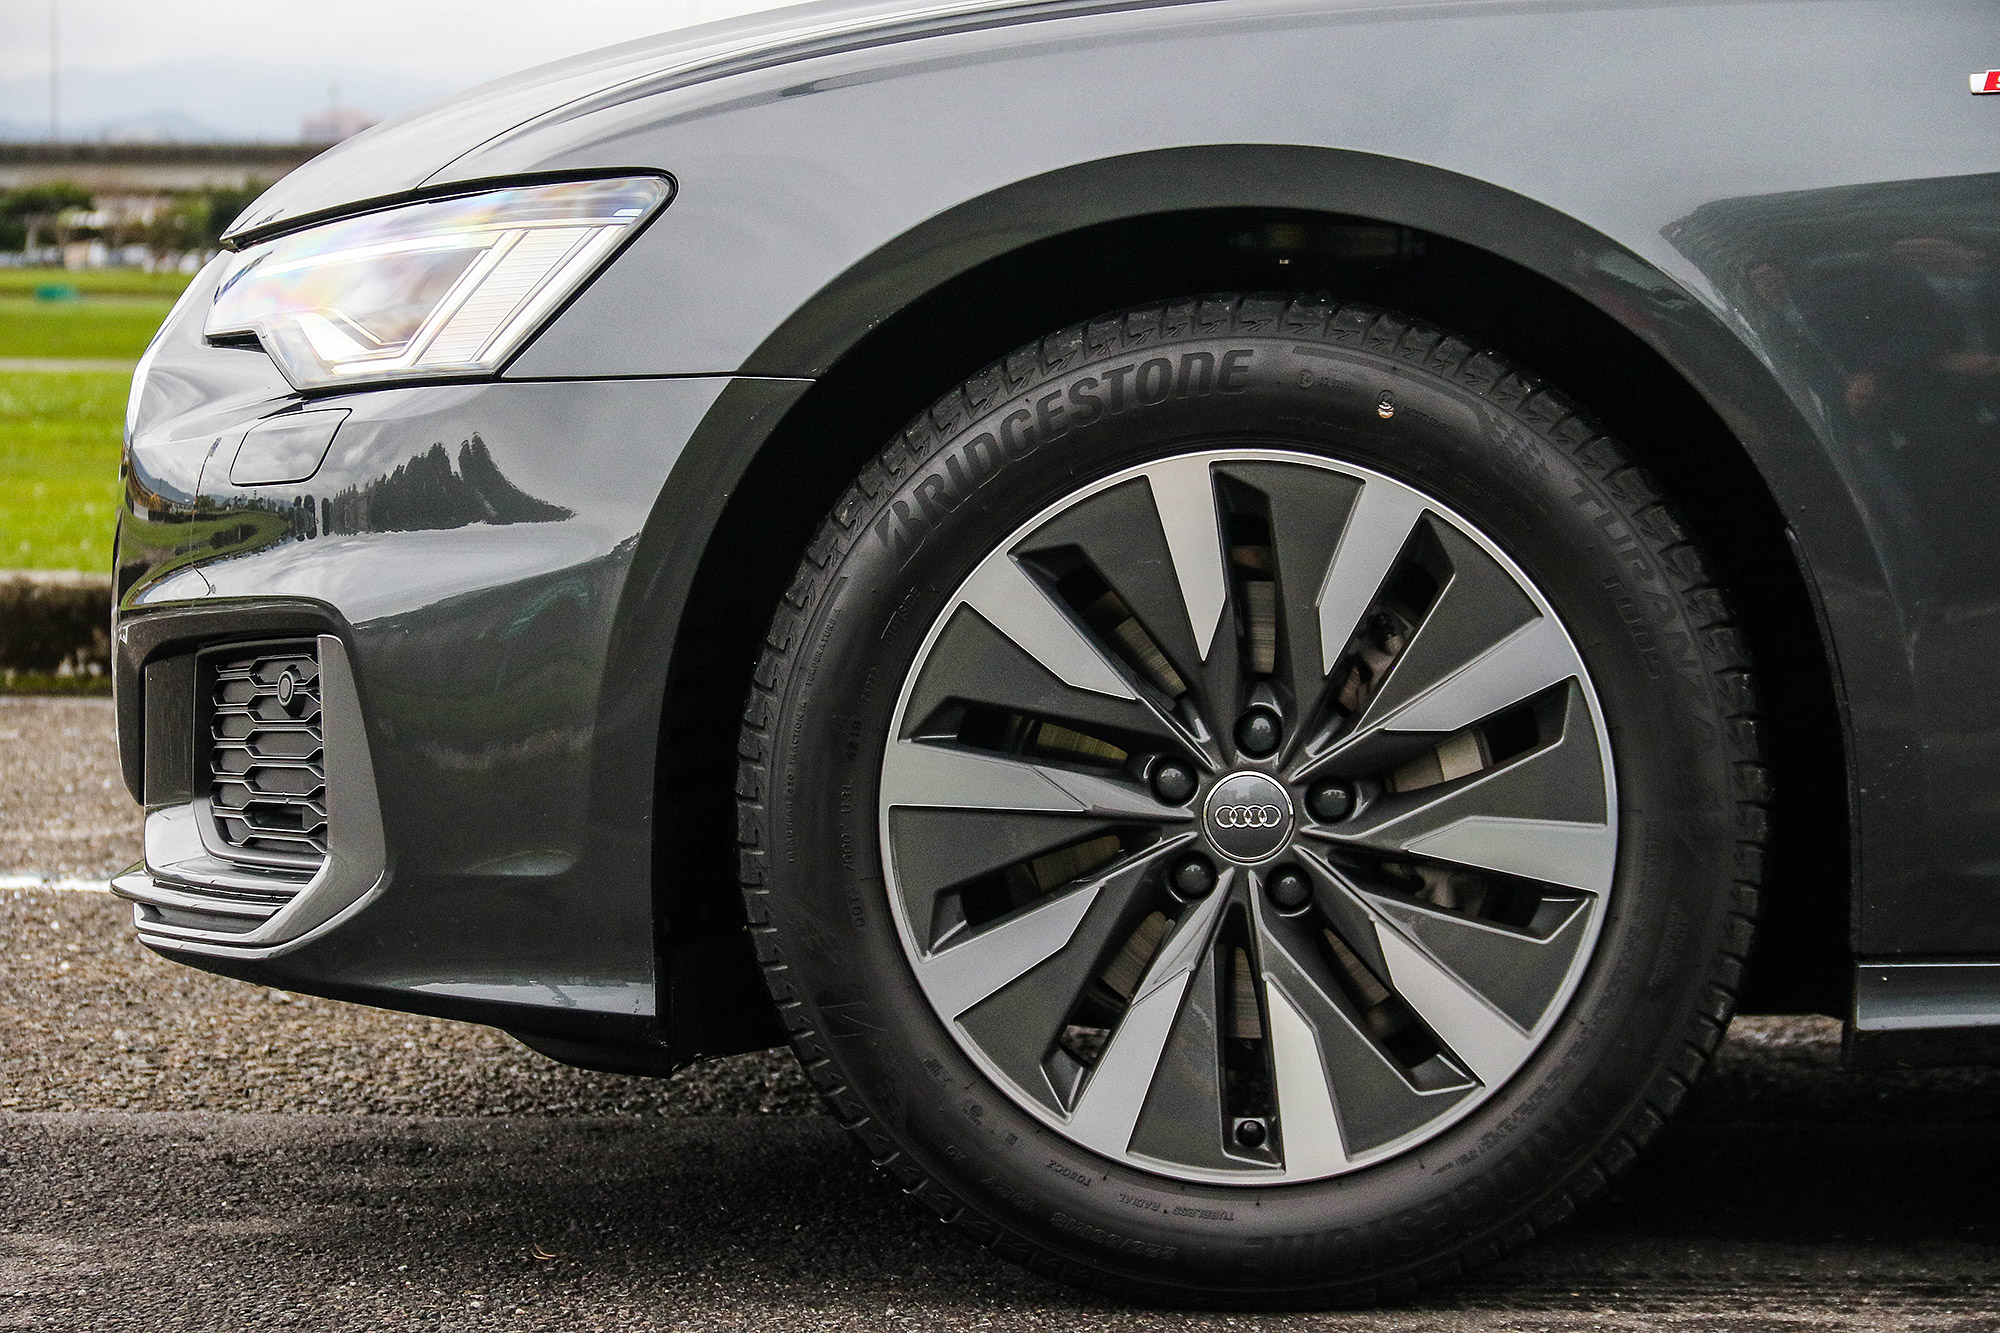 S line 套件組合整合有低風阻刀鋒式輪圈。